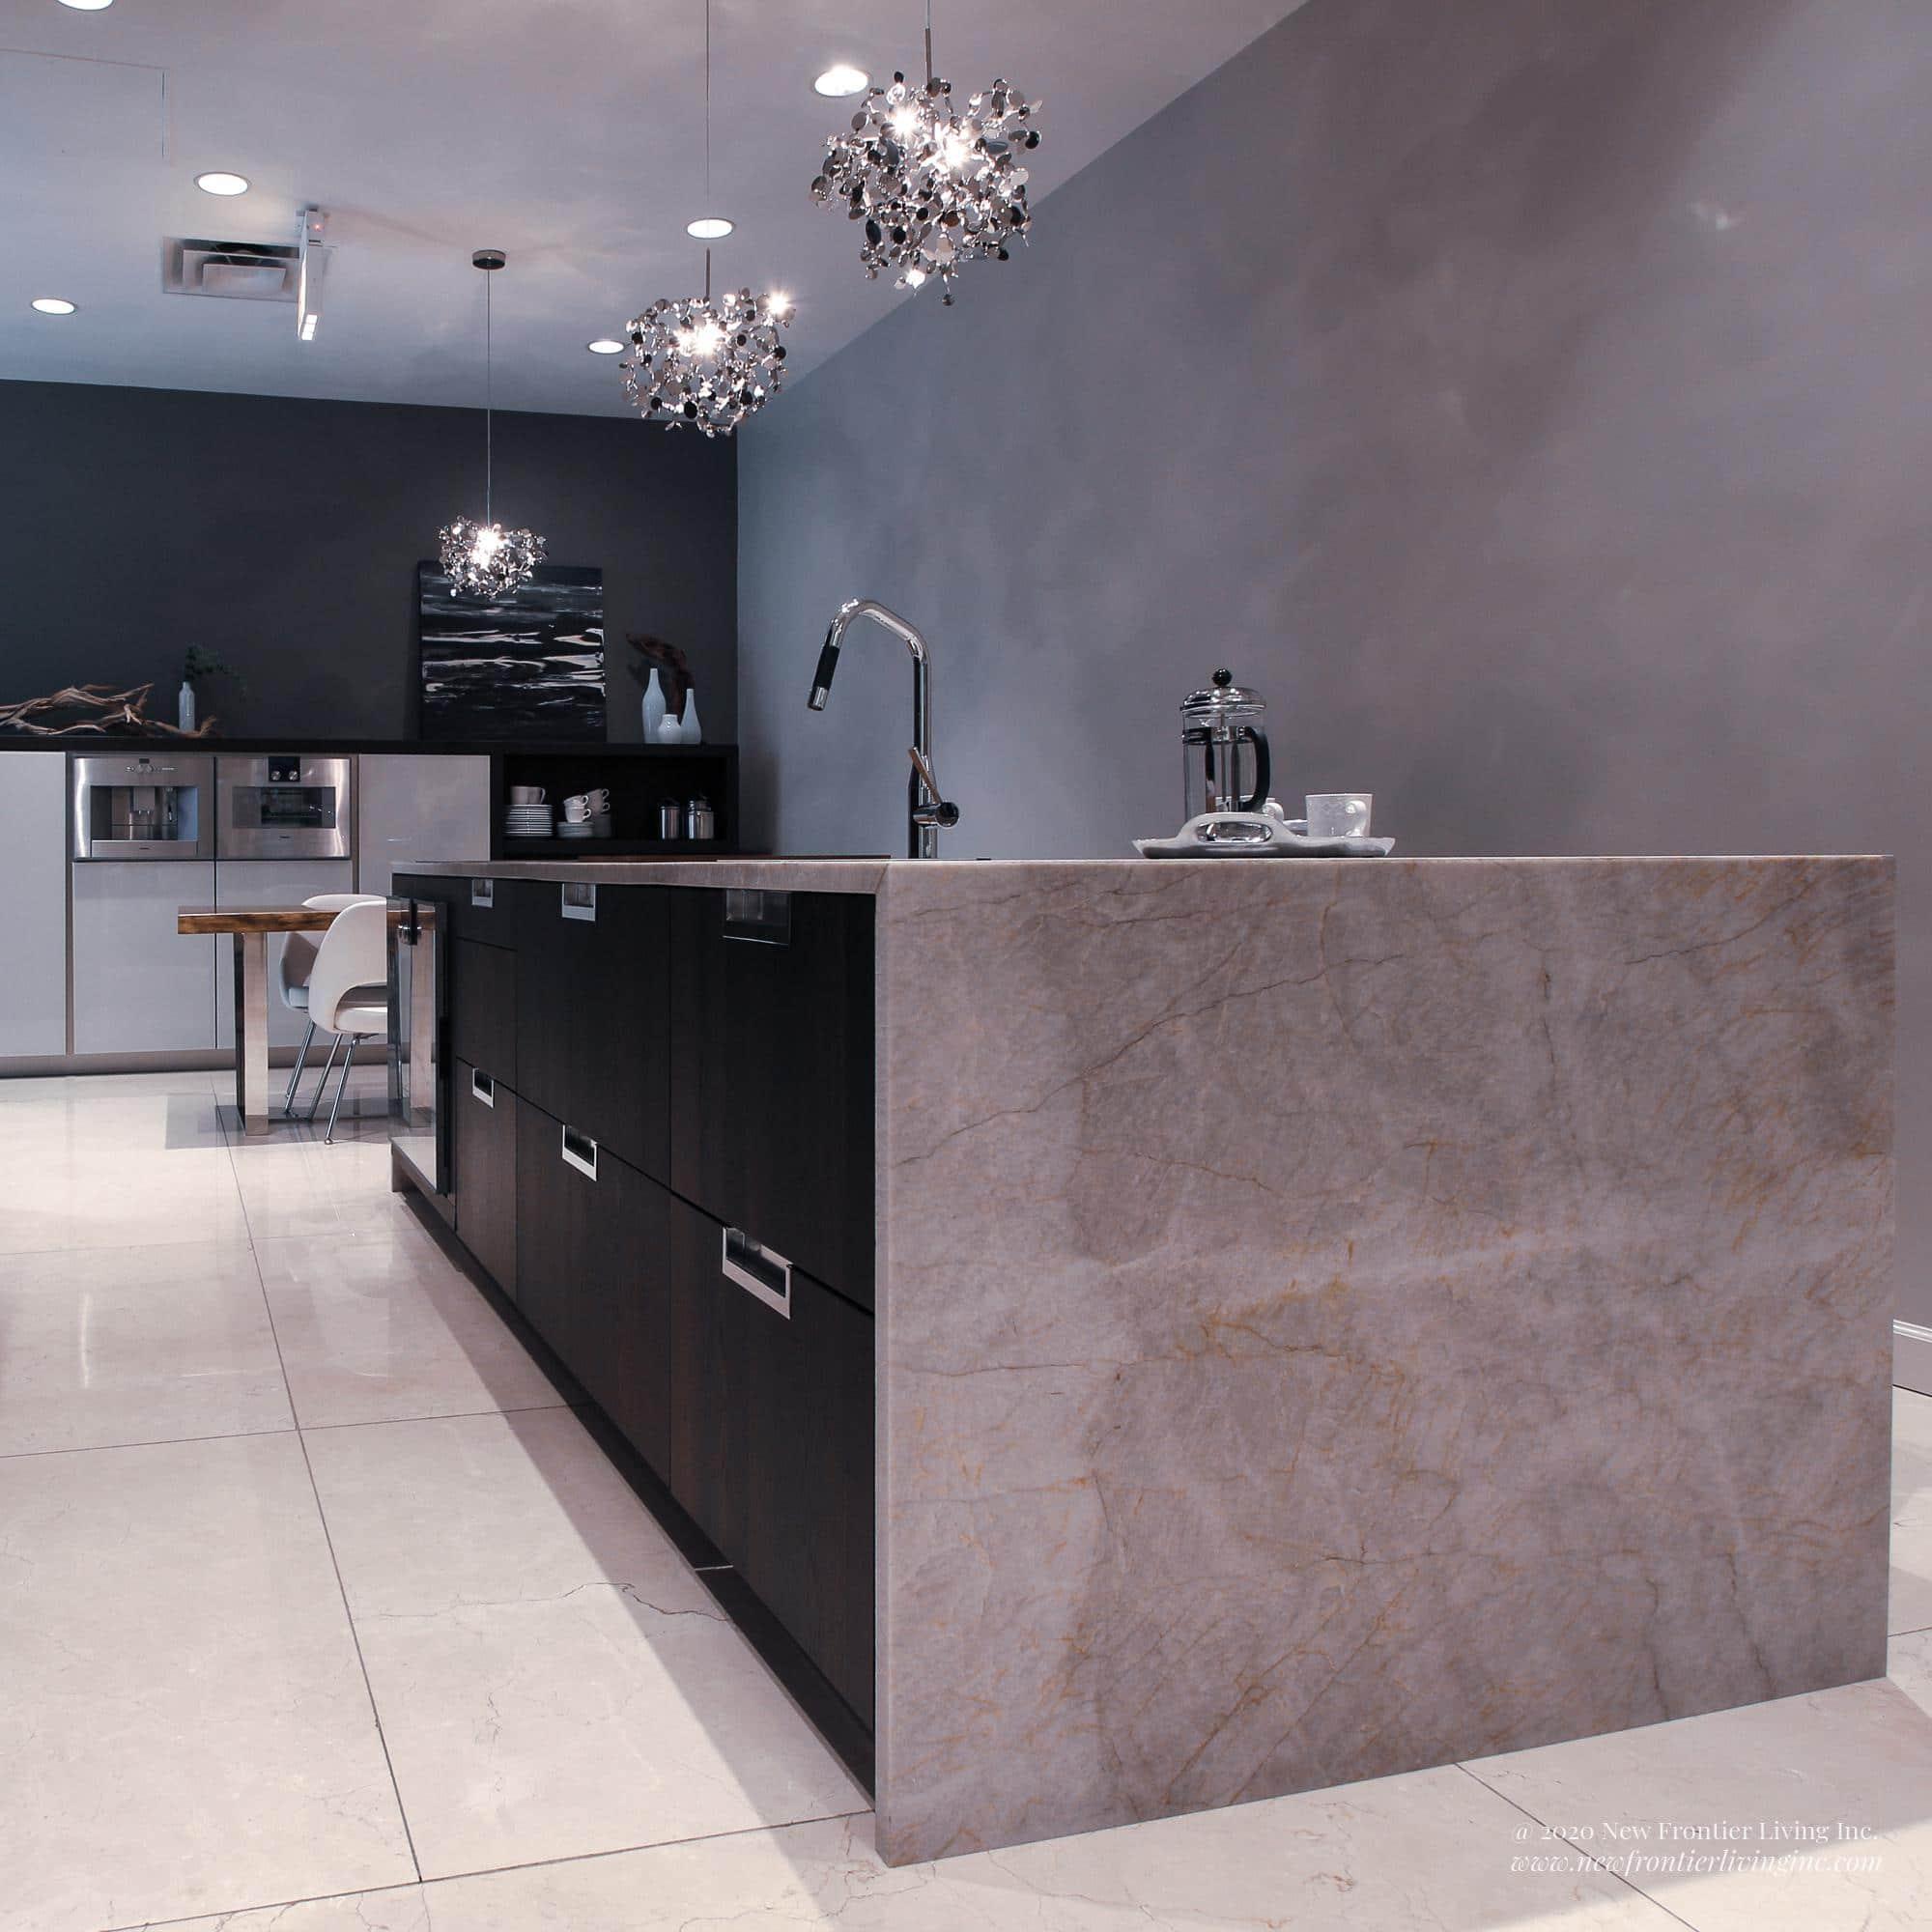 Cream kitchen waterfall island with black cabinets